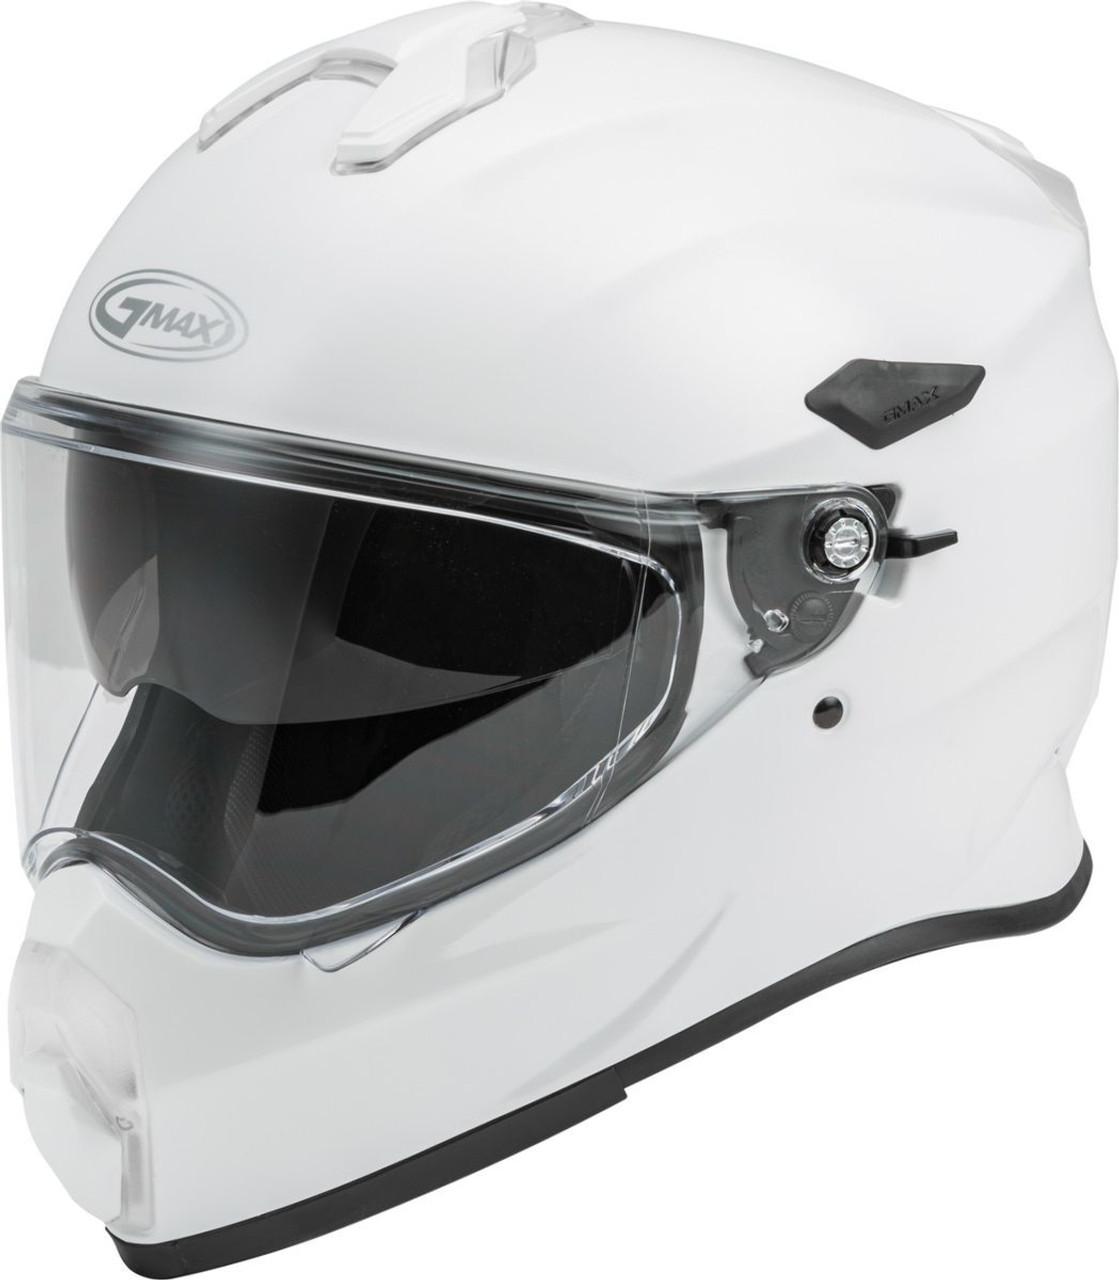 AT-21 Adventure Helmet